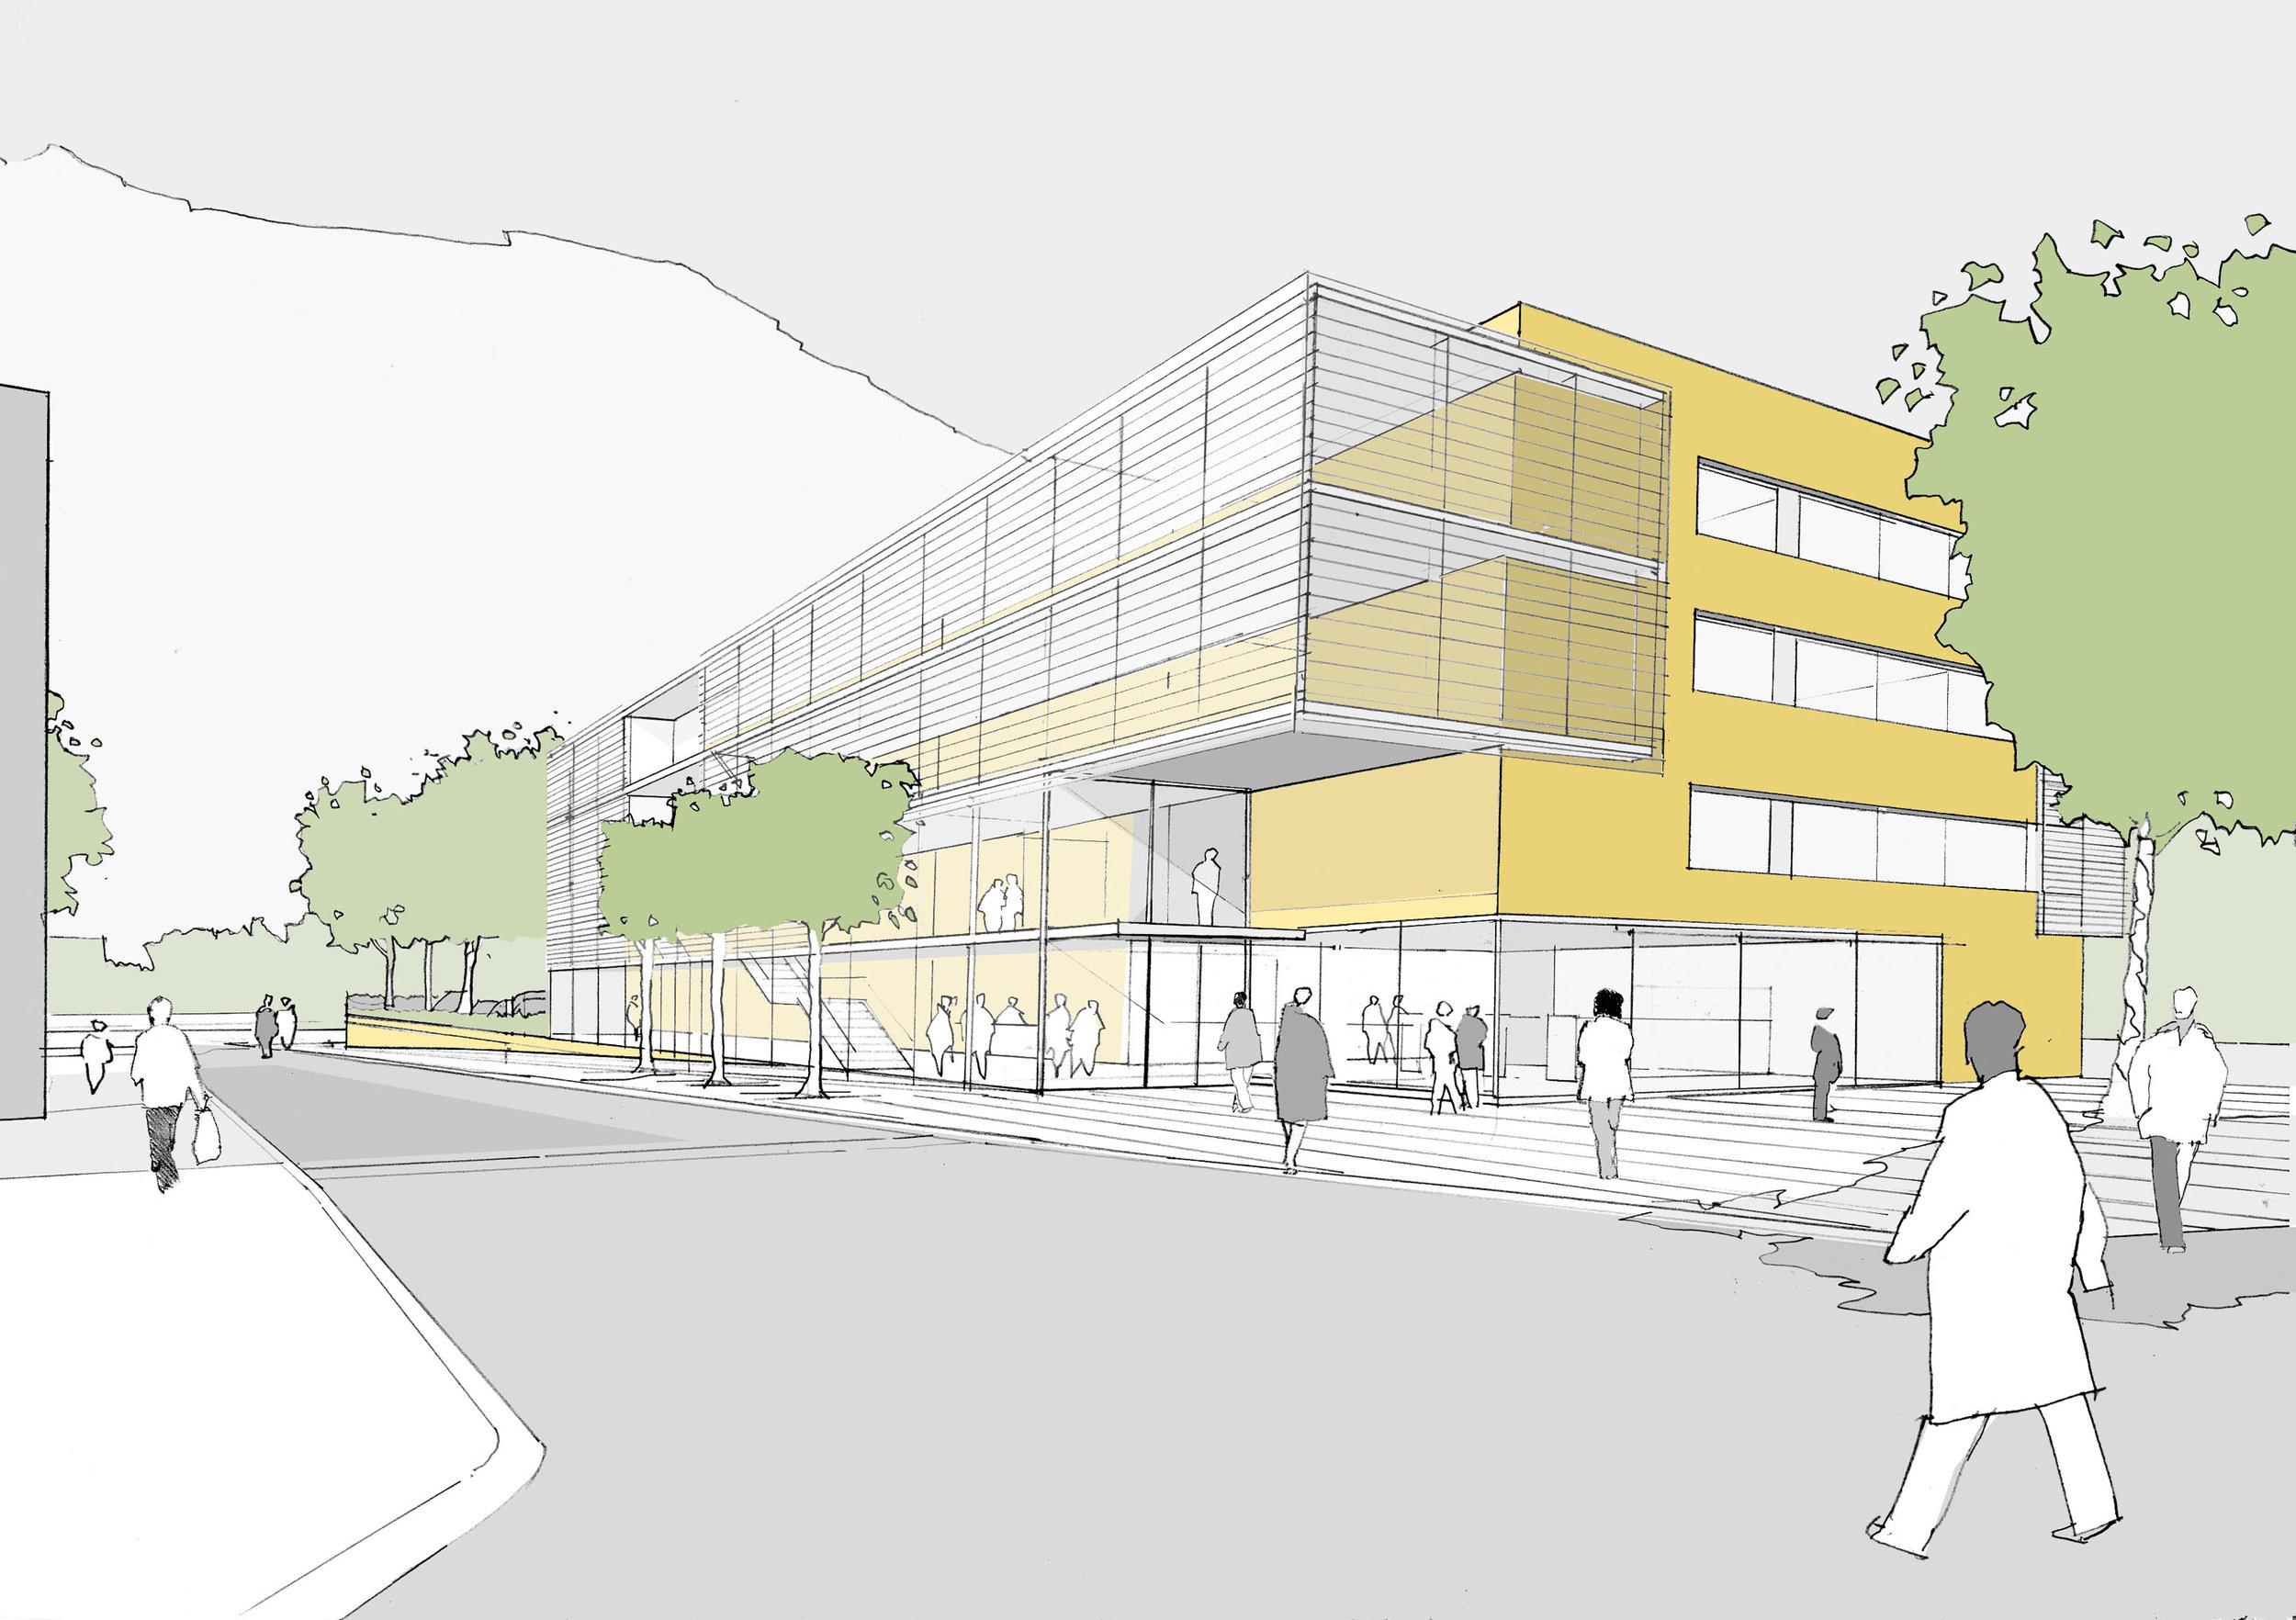 klinikumfrankfurt, persperktive, plan4architekten, munich, germanarchitecture, londonarchitect, visuals, handdrawings, newbuild, neebau, development, hospitalarchitecture